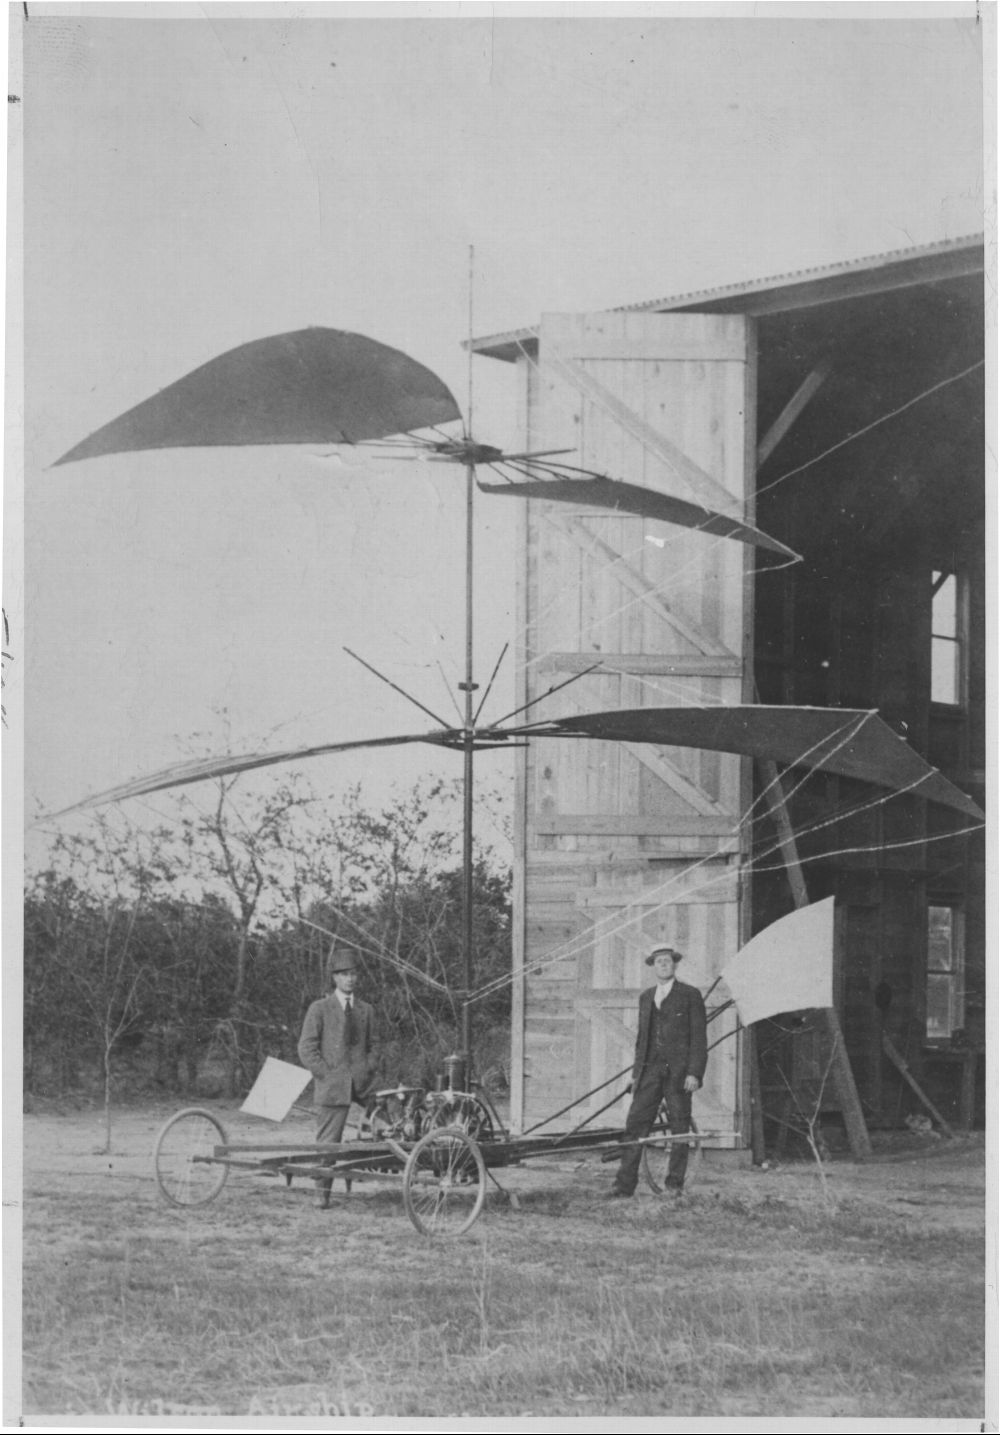 1910_Goodland flying machine